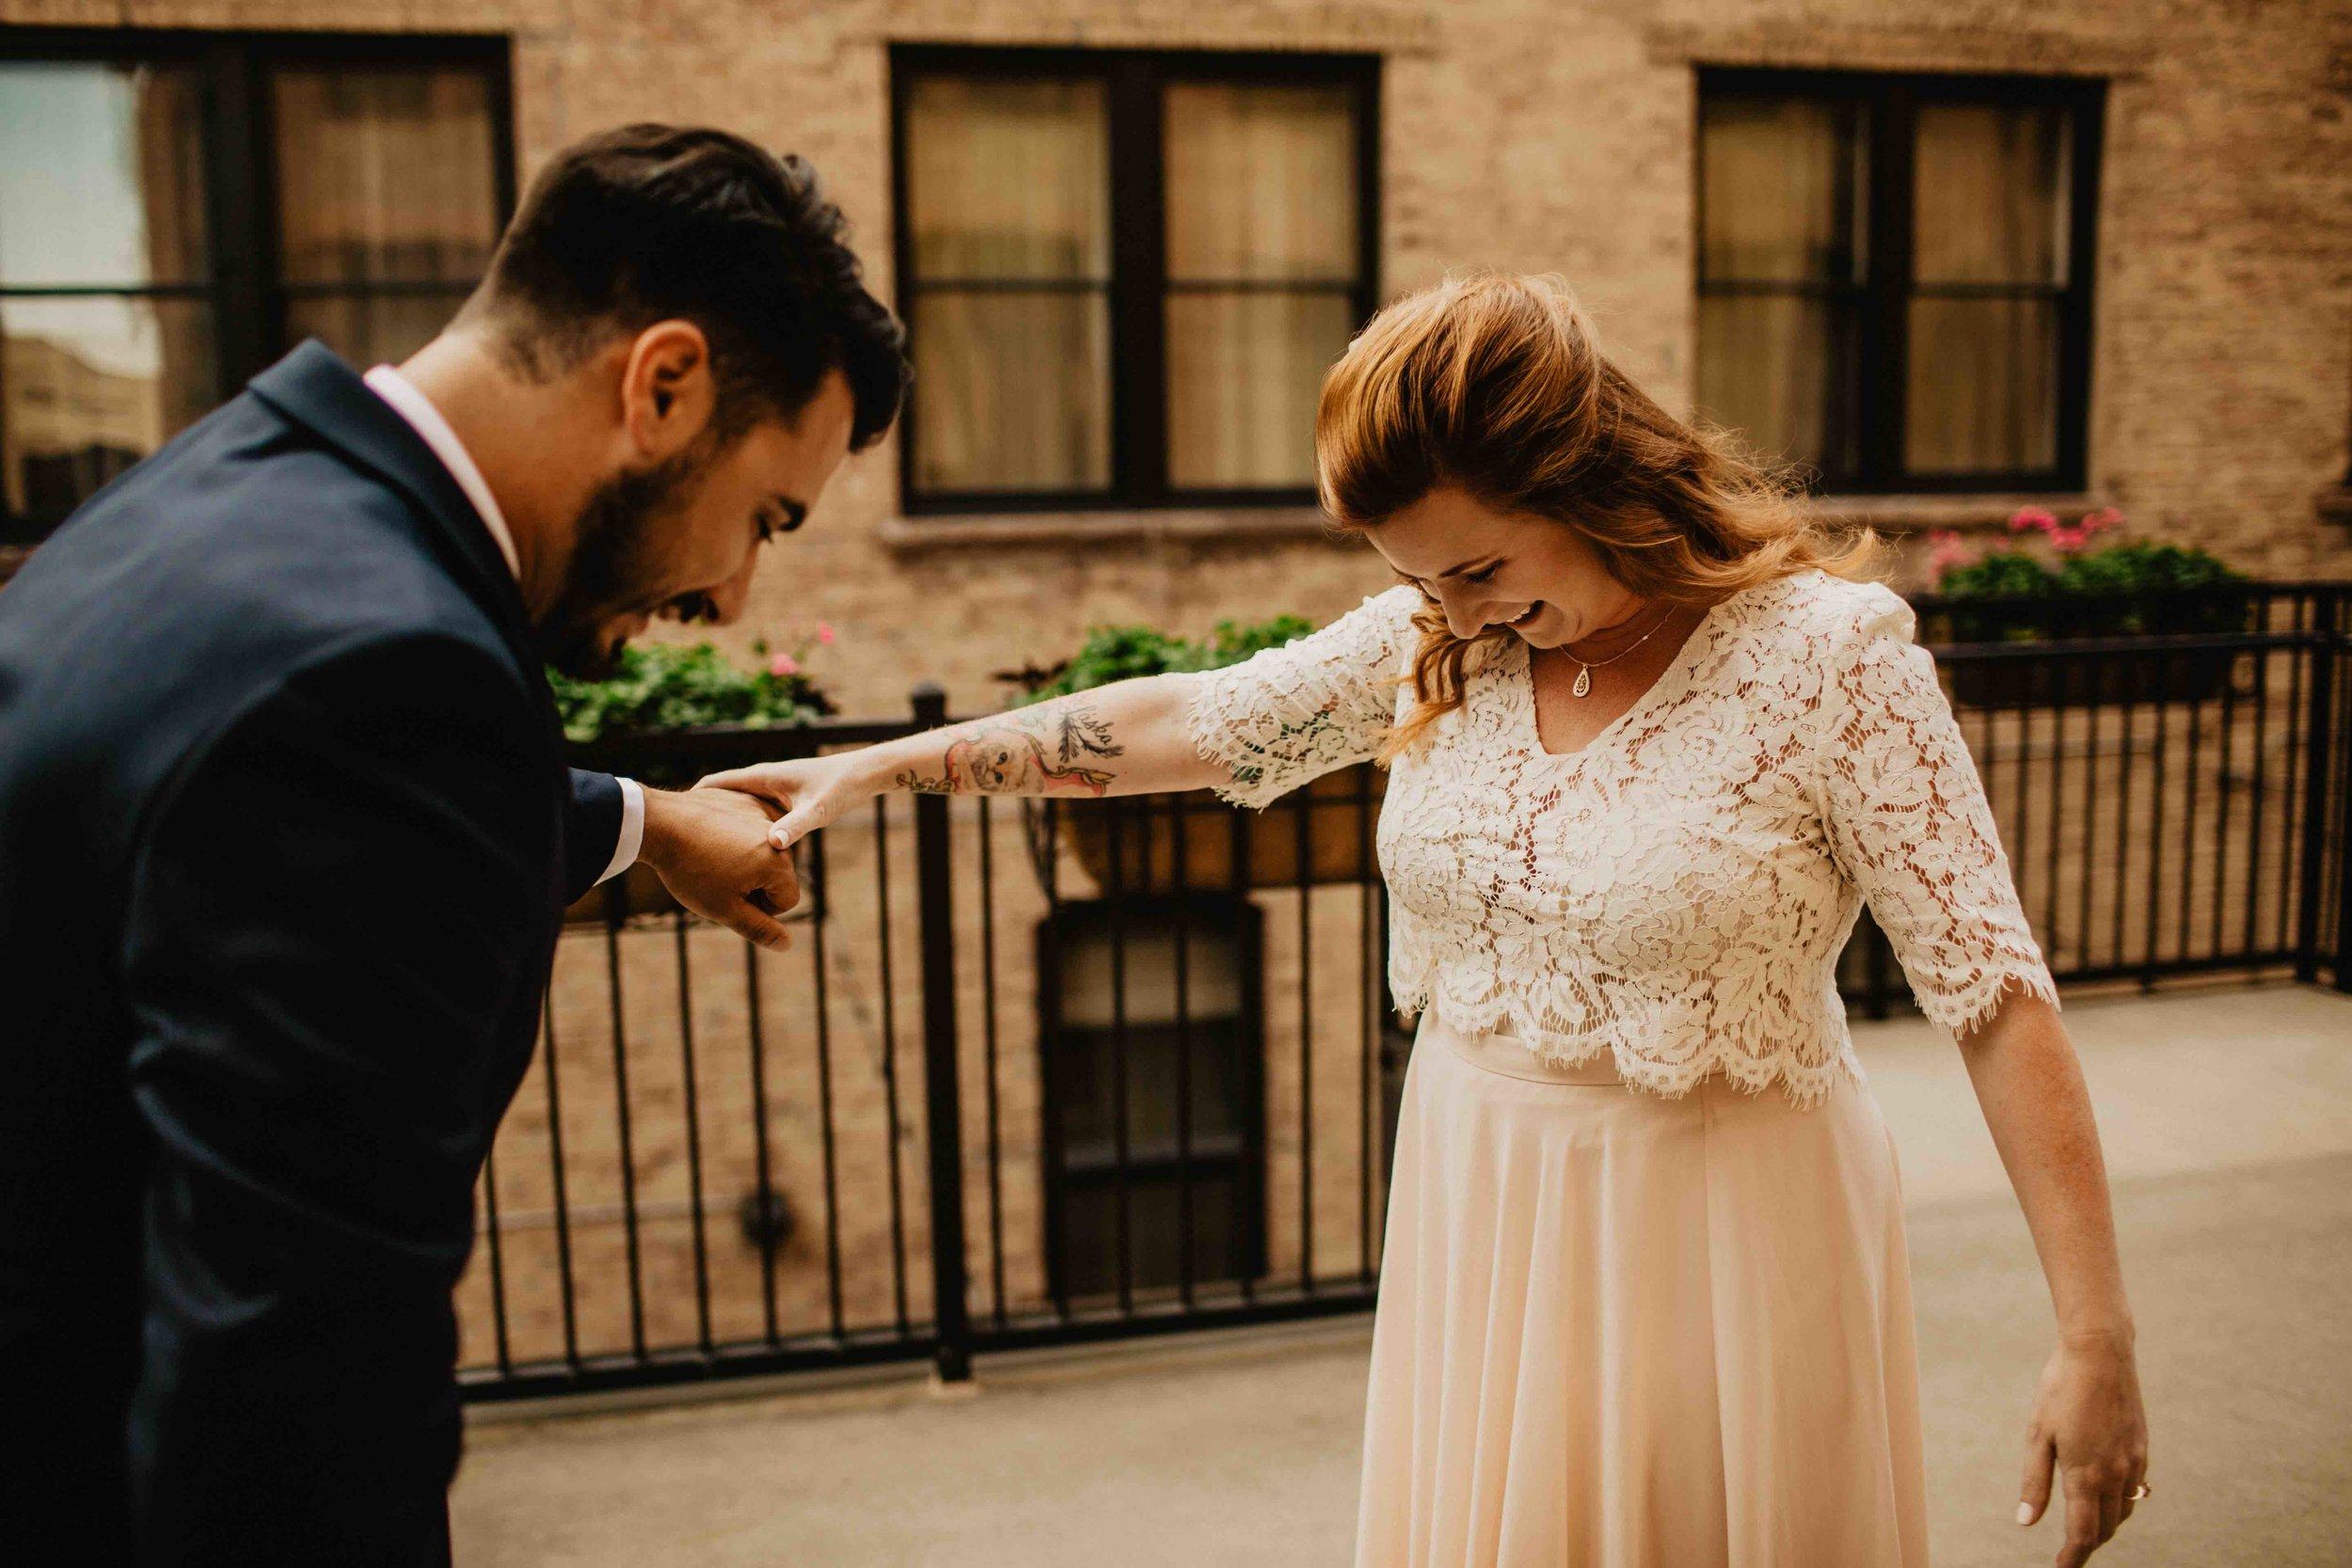 -colorado-wedding-photographer-denver-springs-vail-607A3676.jpeg